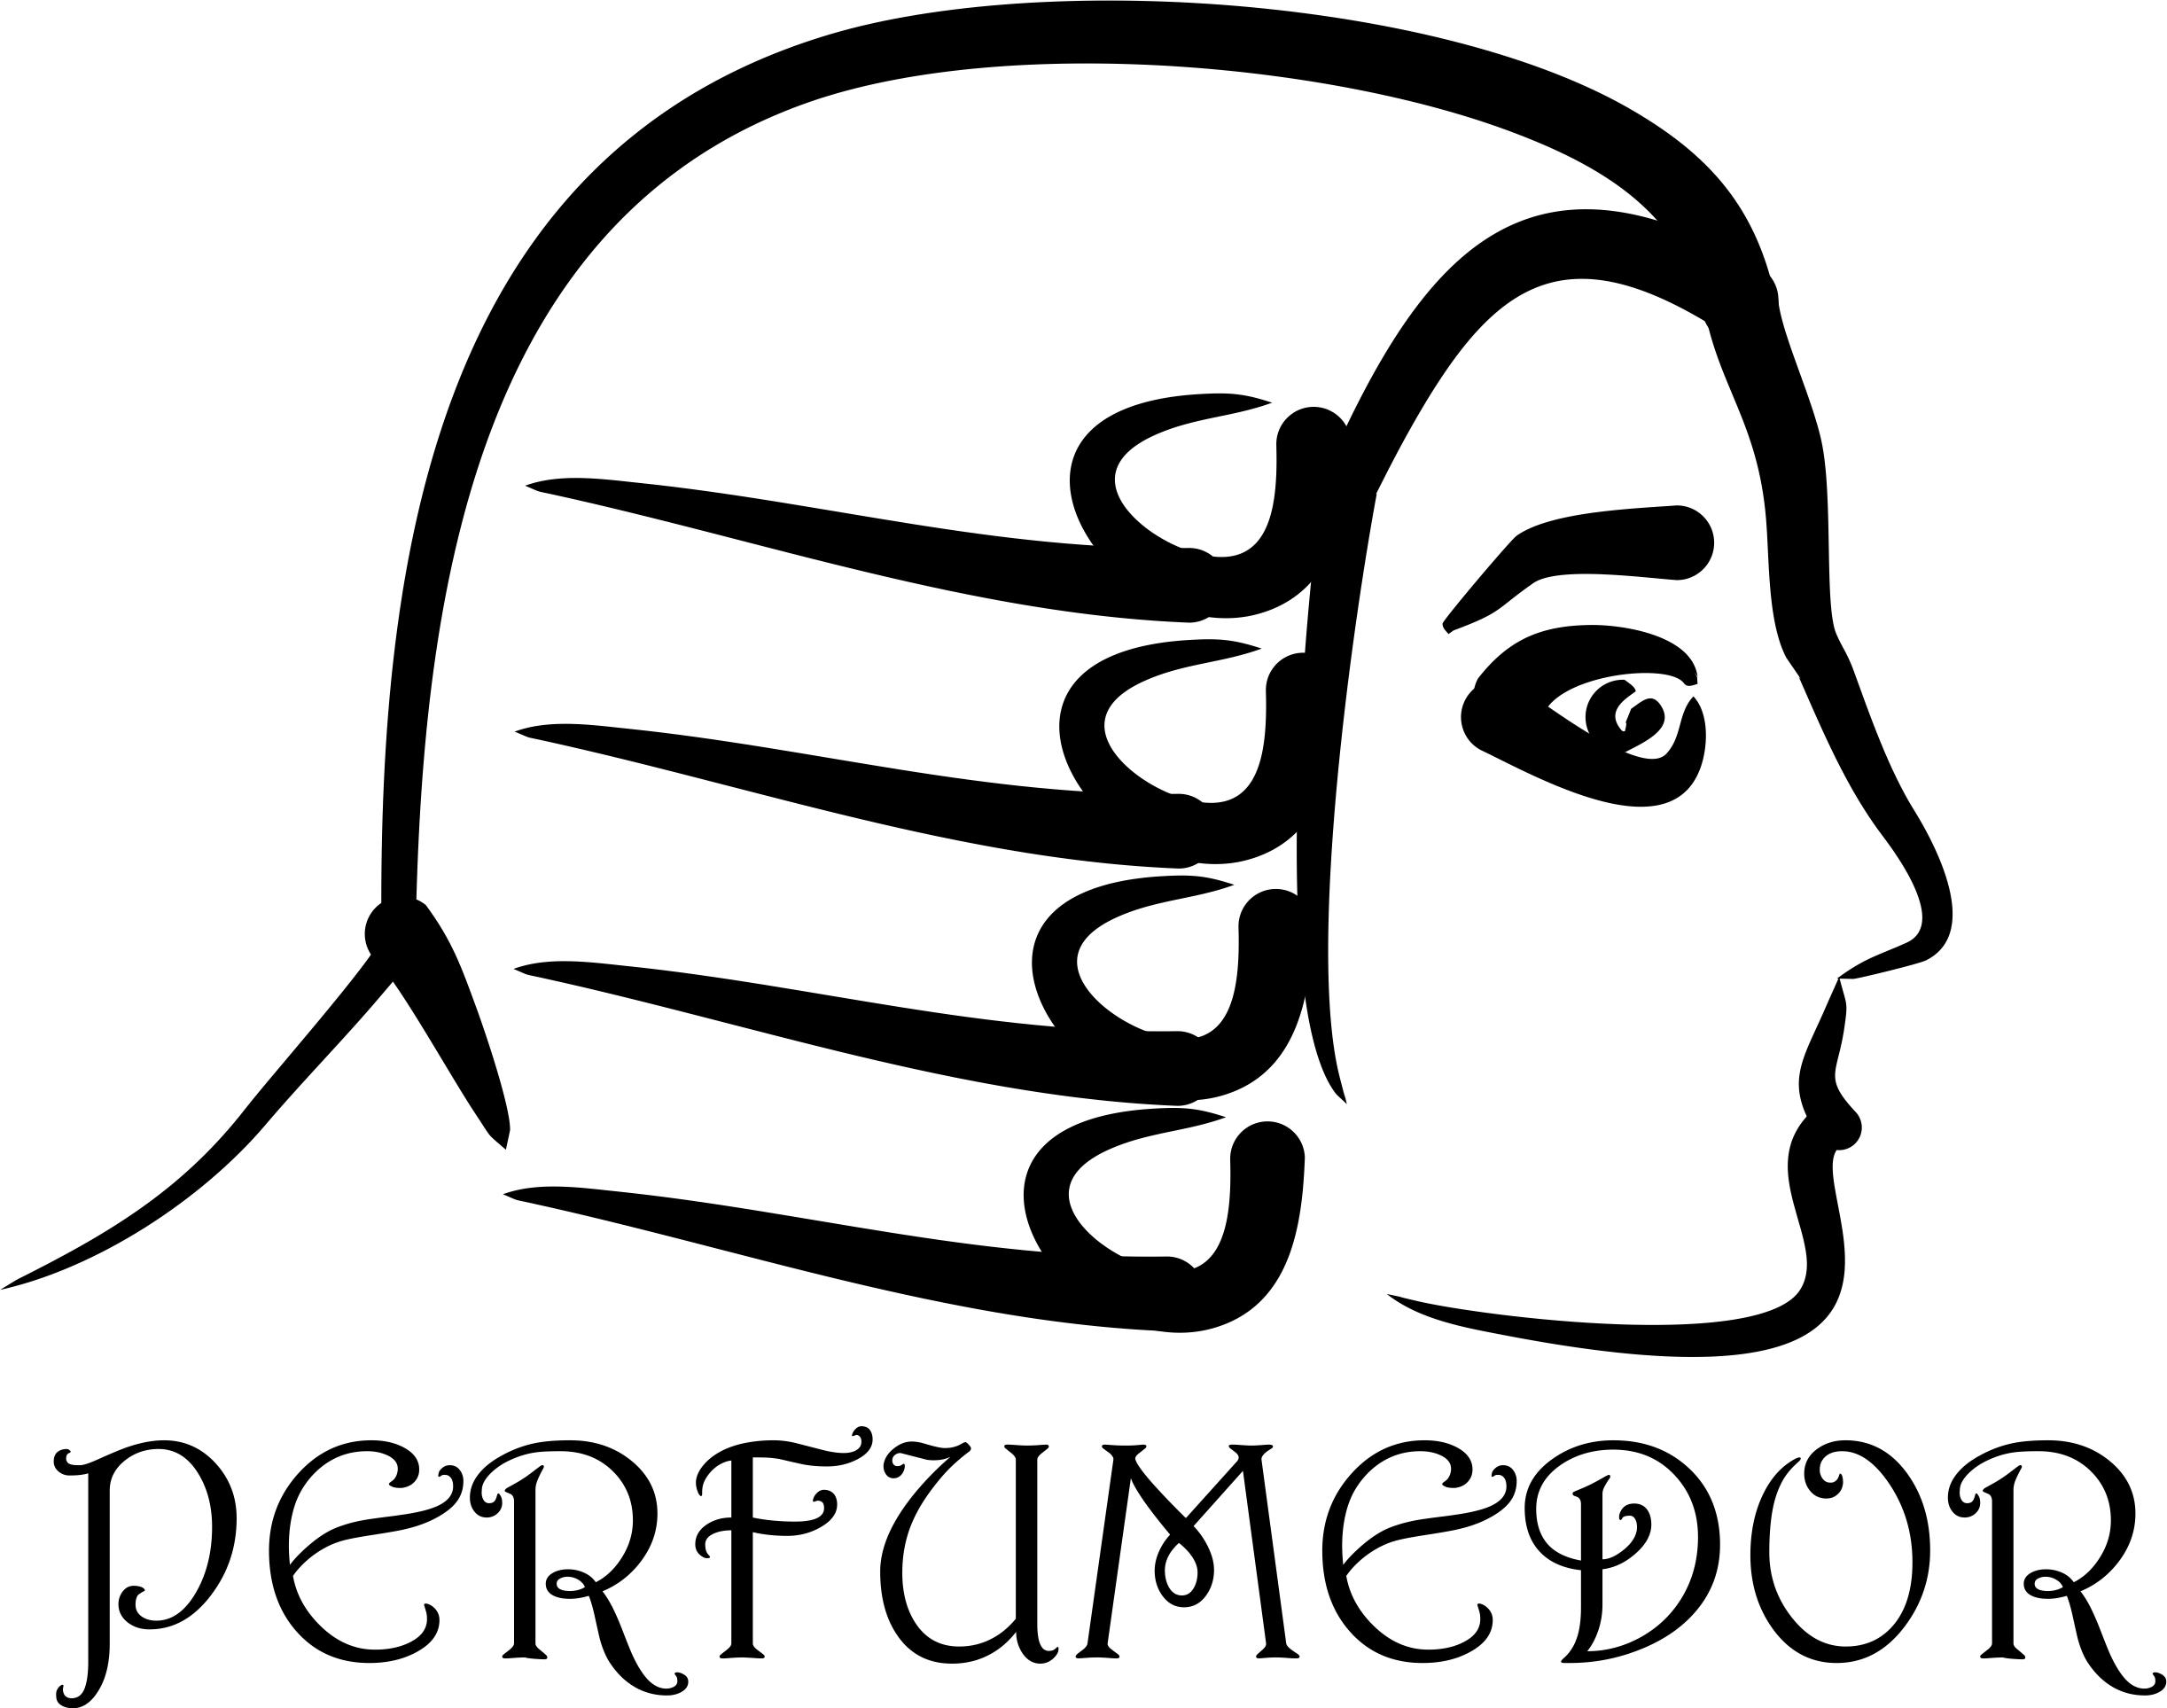 Логотип для интернет-магазина парфюмерии фото f_7125b4876ae36bde.jpg